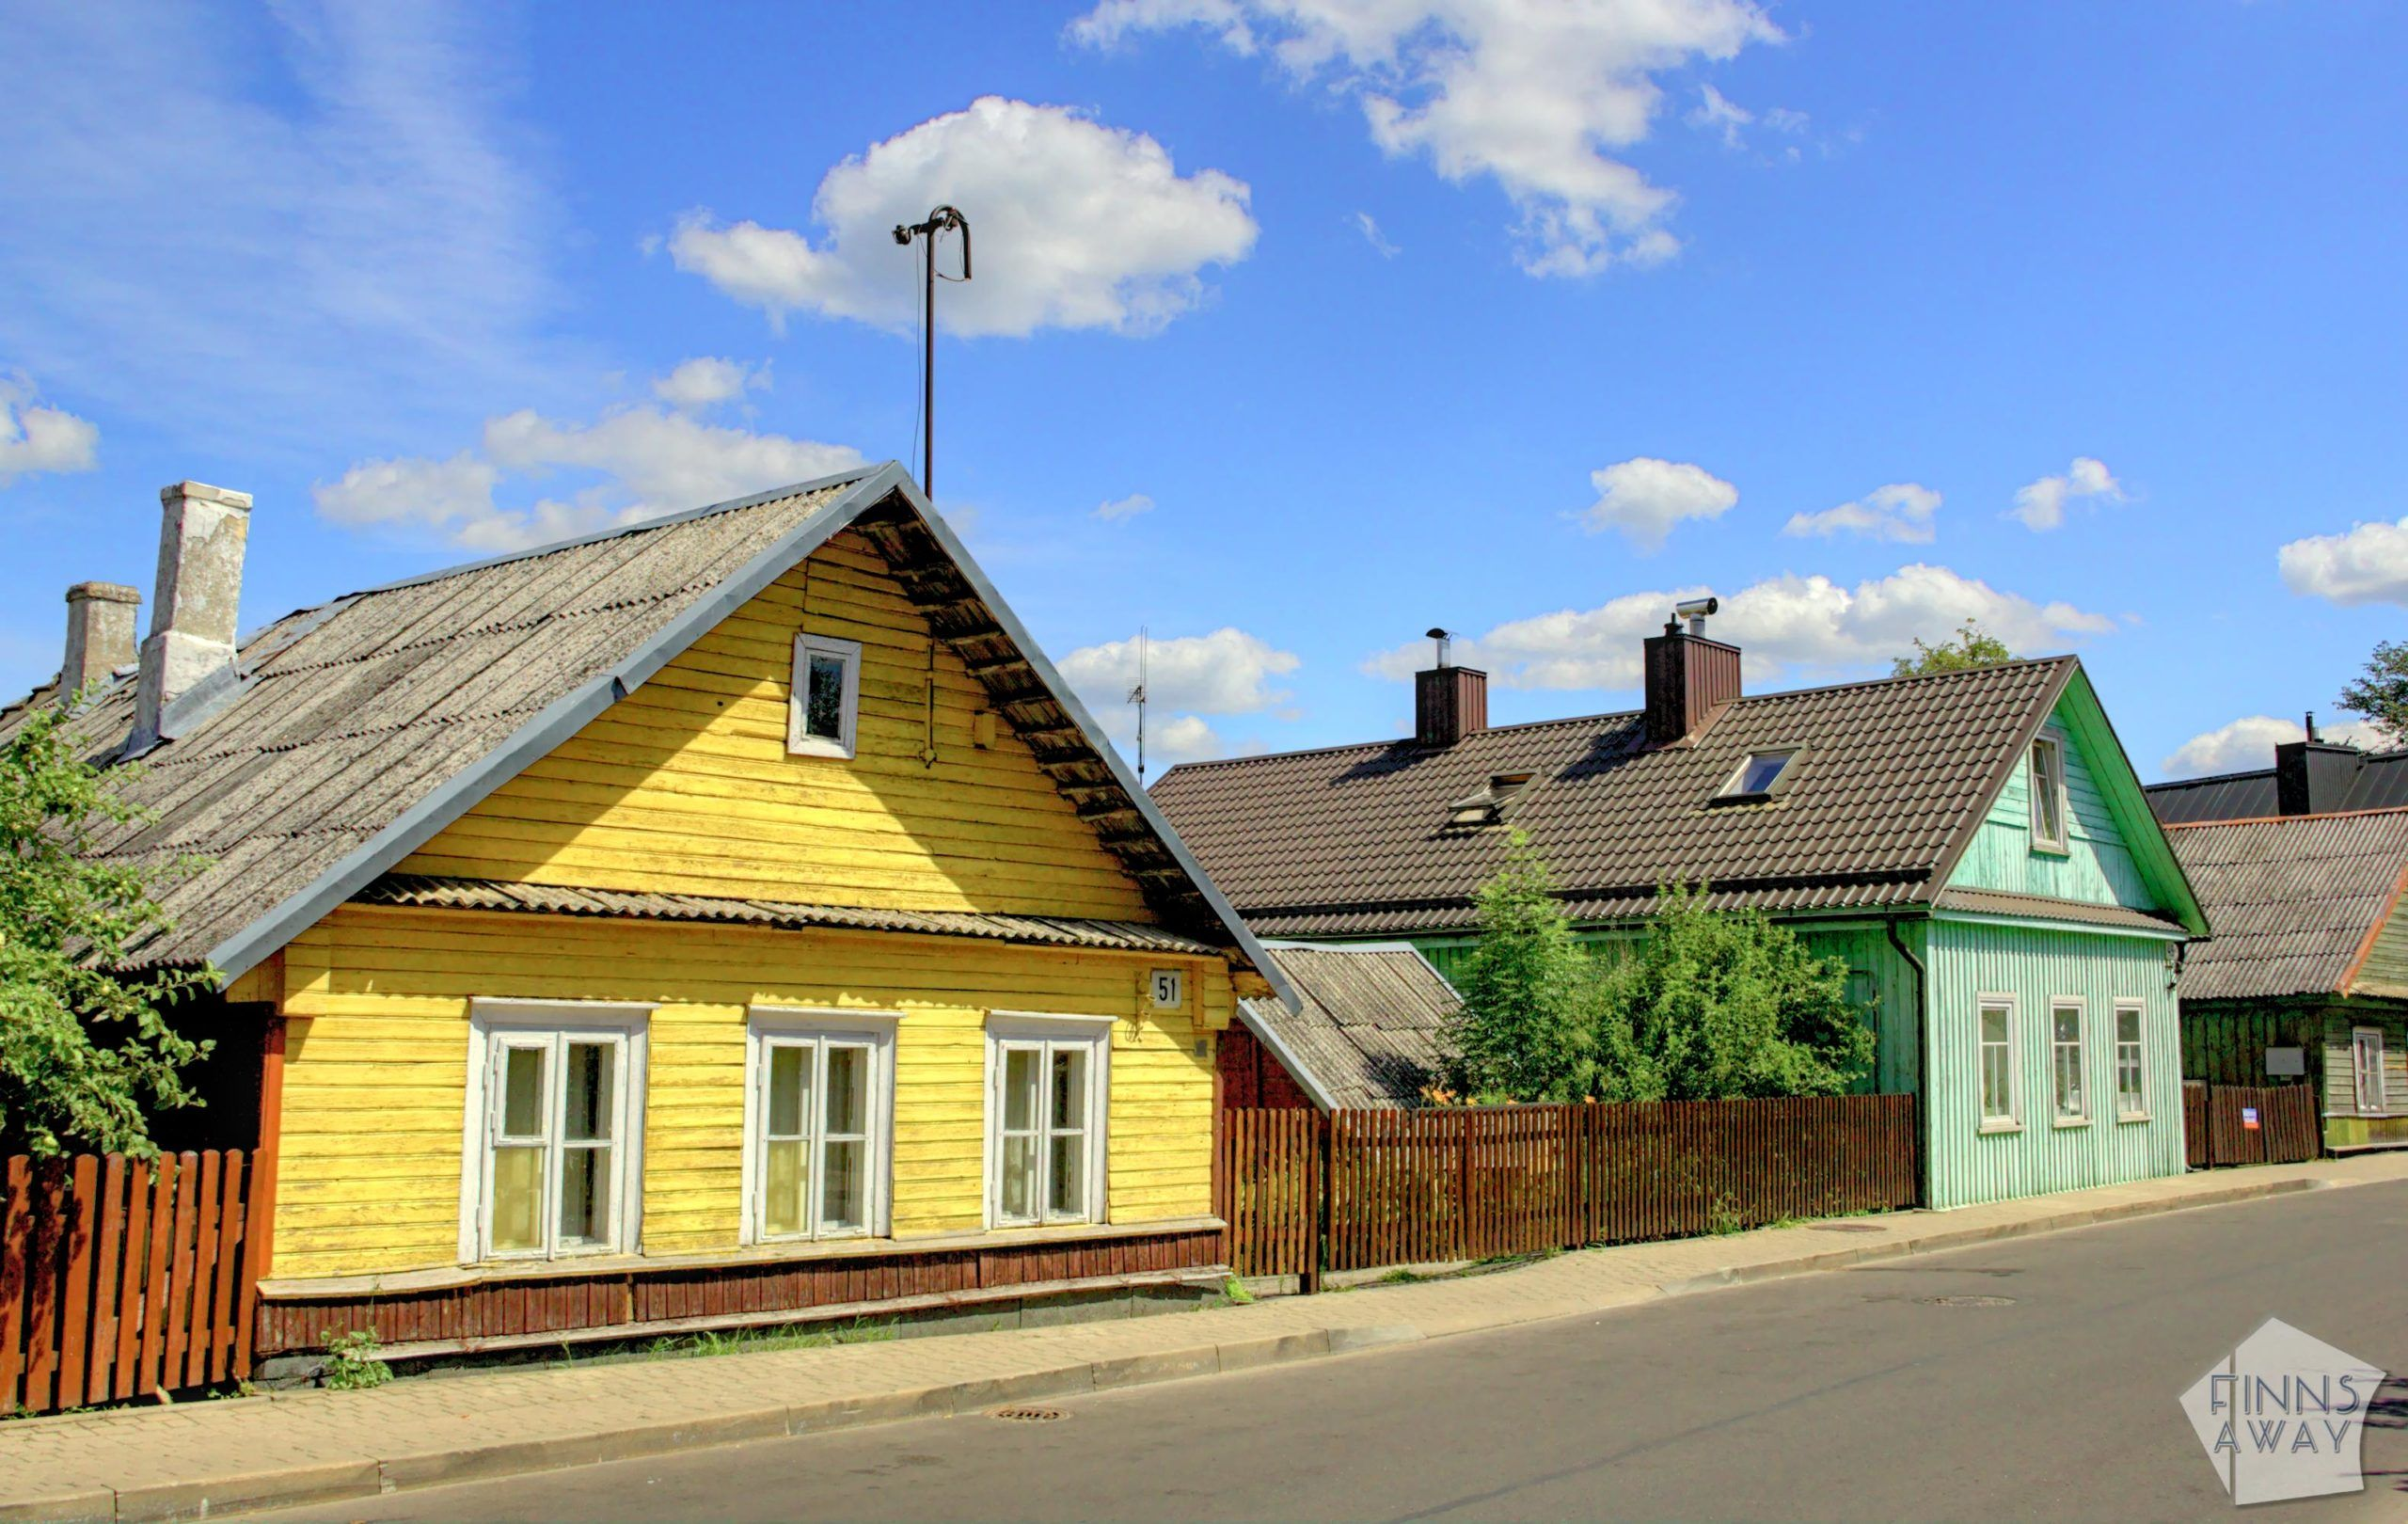 Wooden Karaim houses | Trakai in Lithuania – castles, Karaim culture and nature | FinnsAway Travel Blog